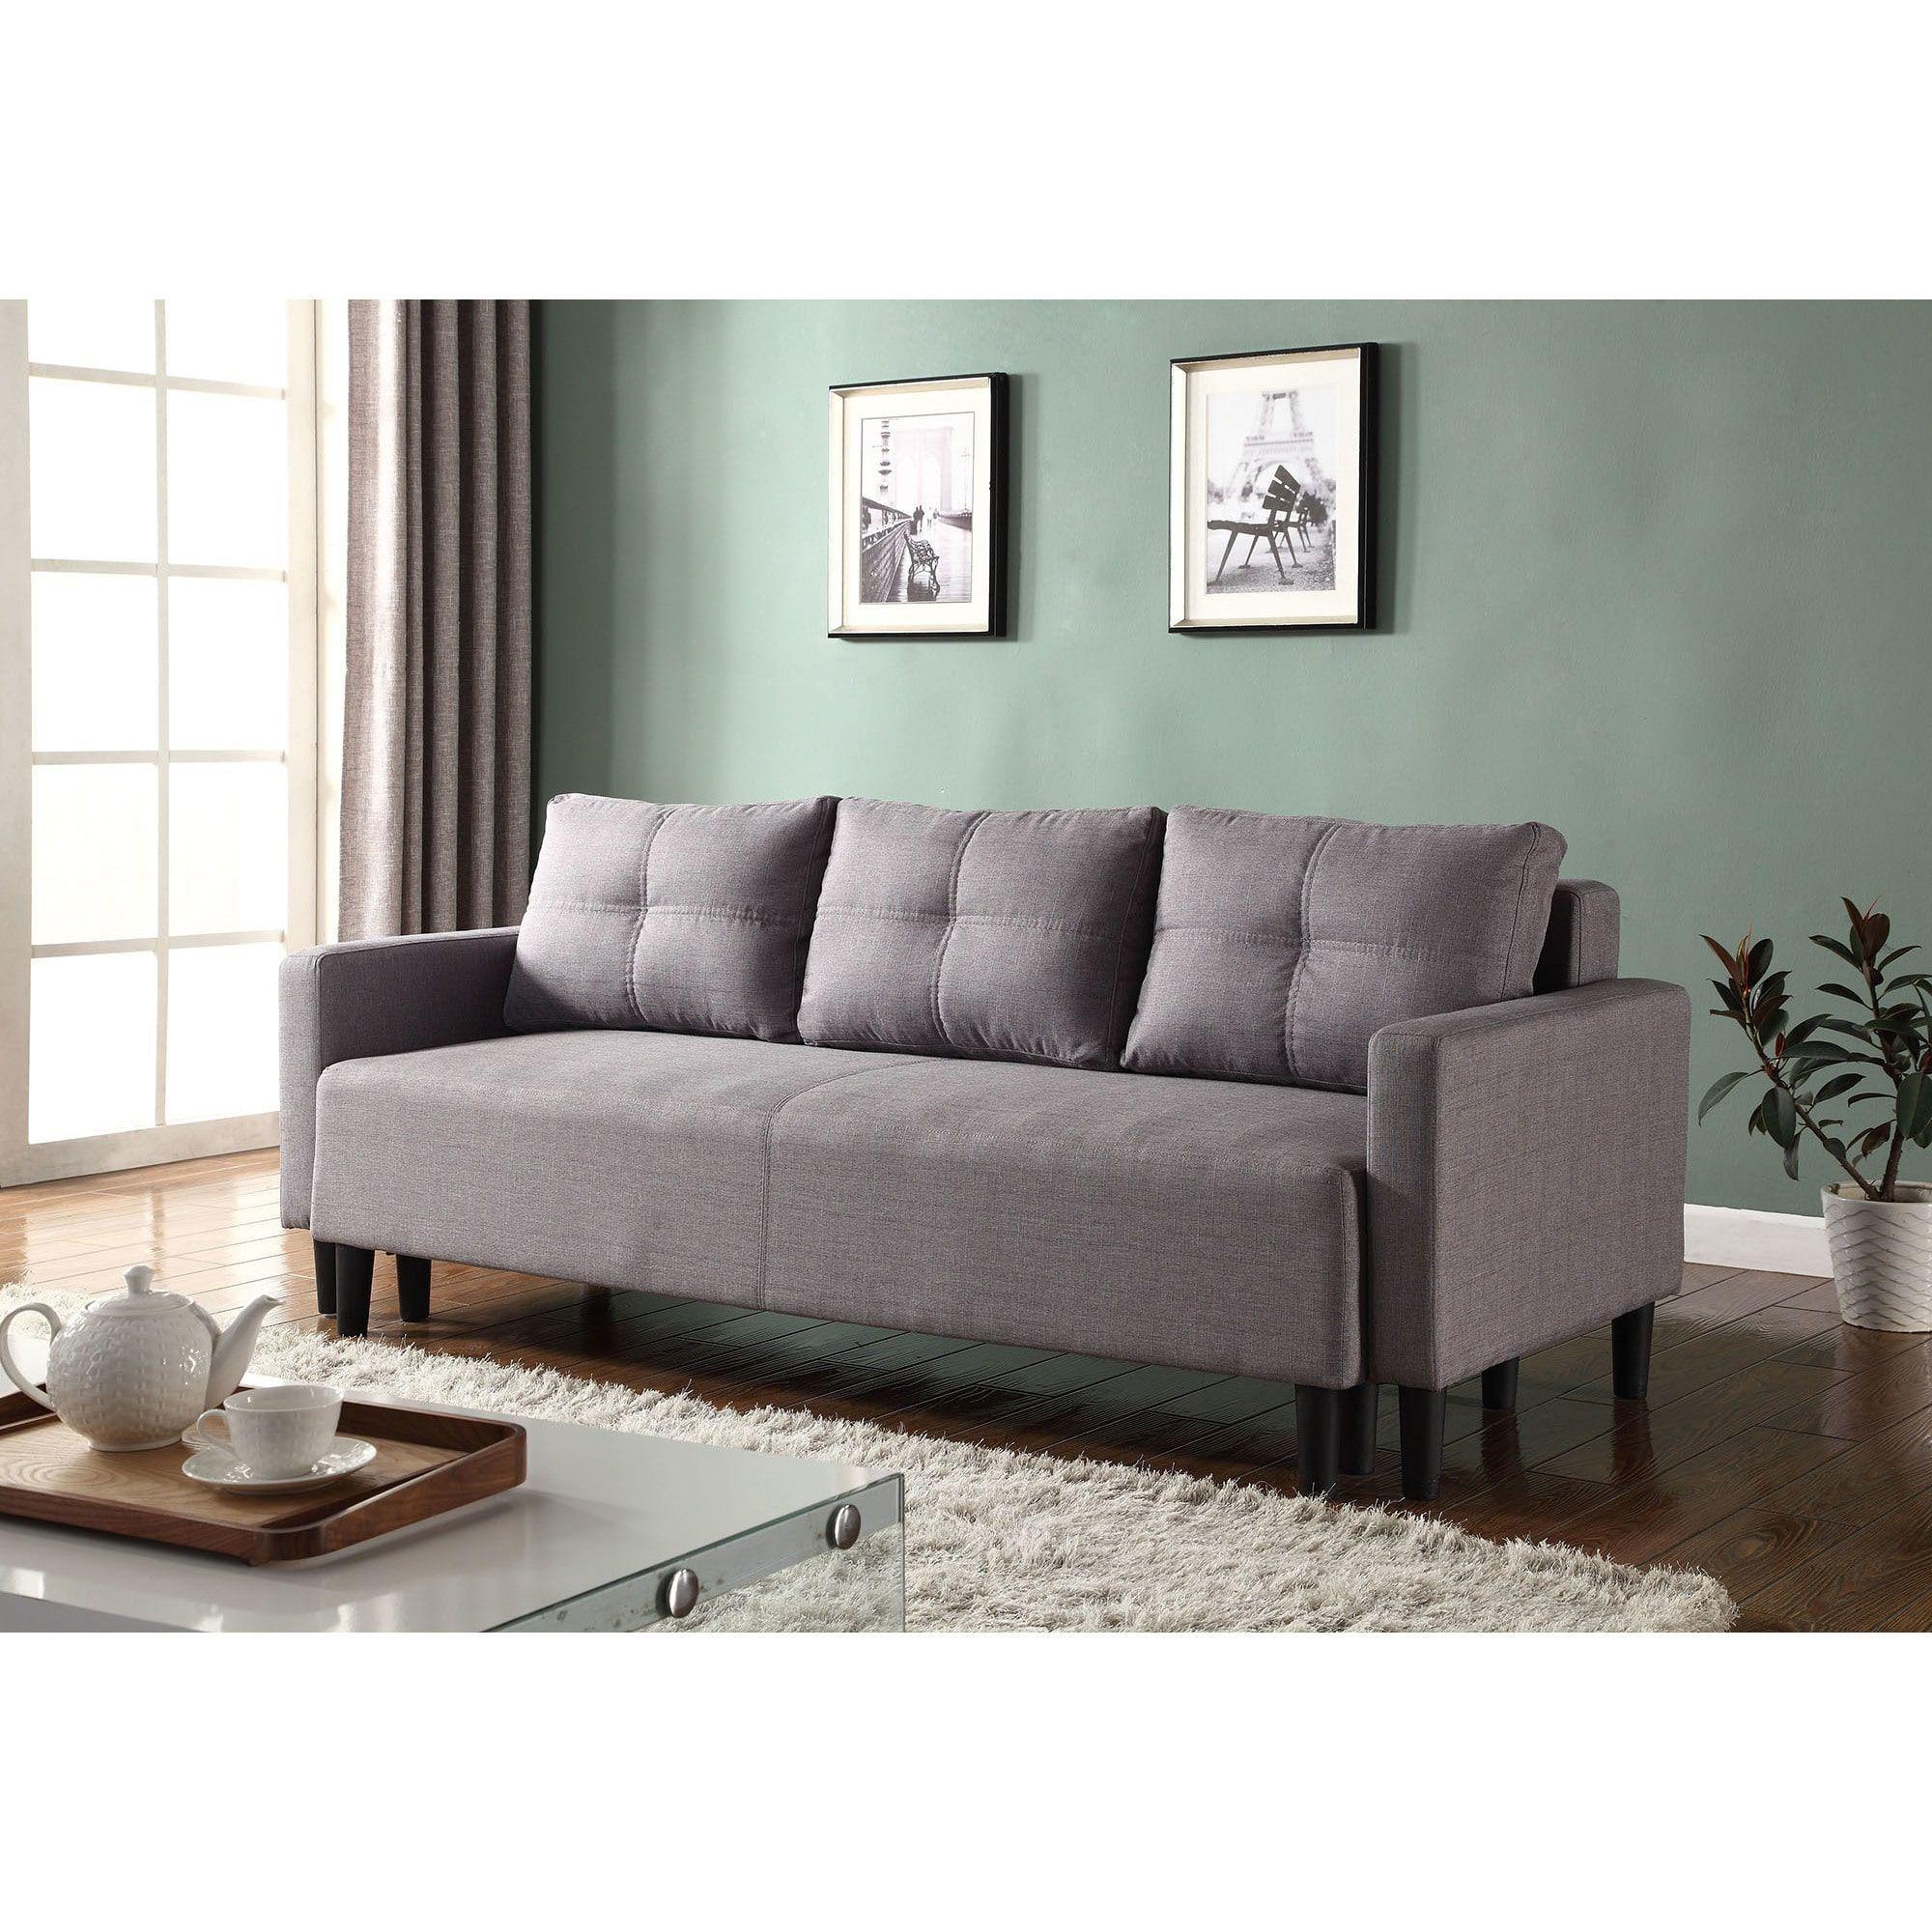 Best Master Furniture L Adjustable Sofa Bed Futon L